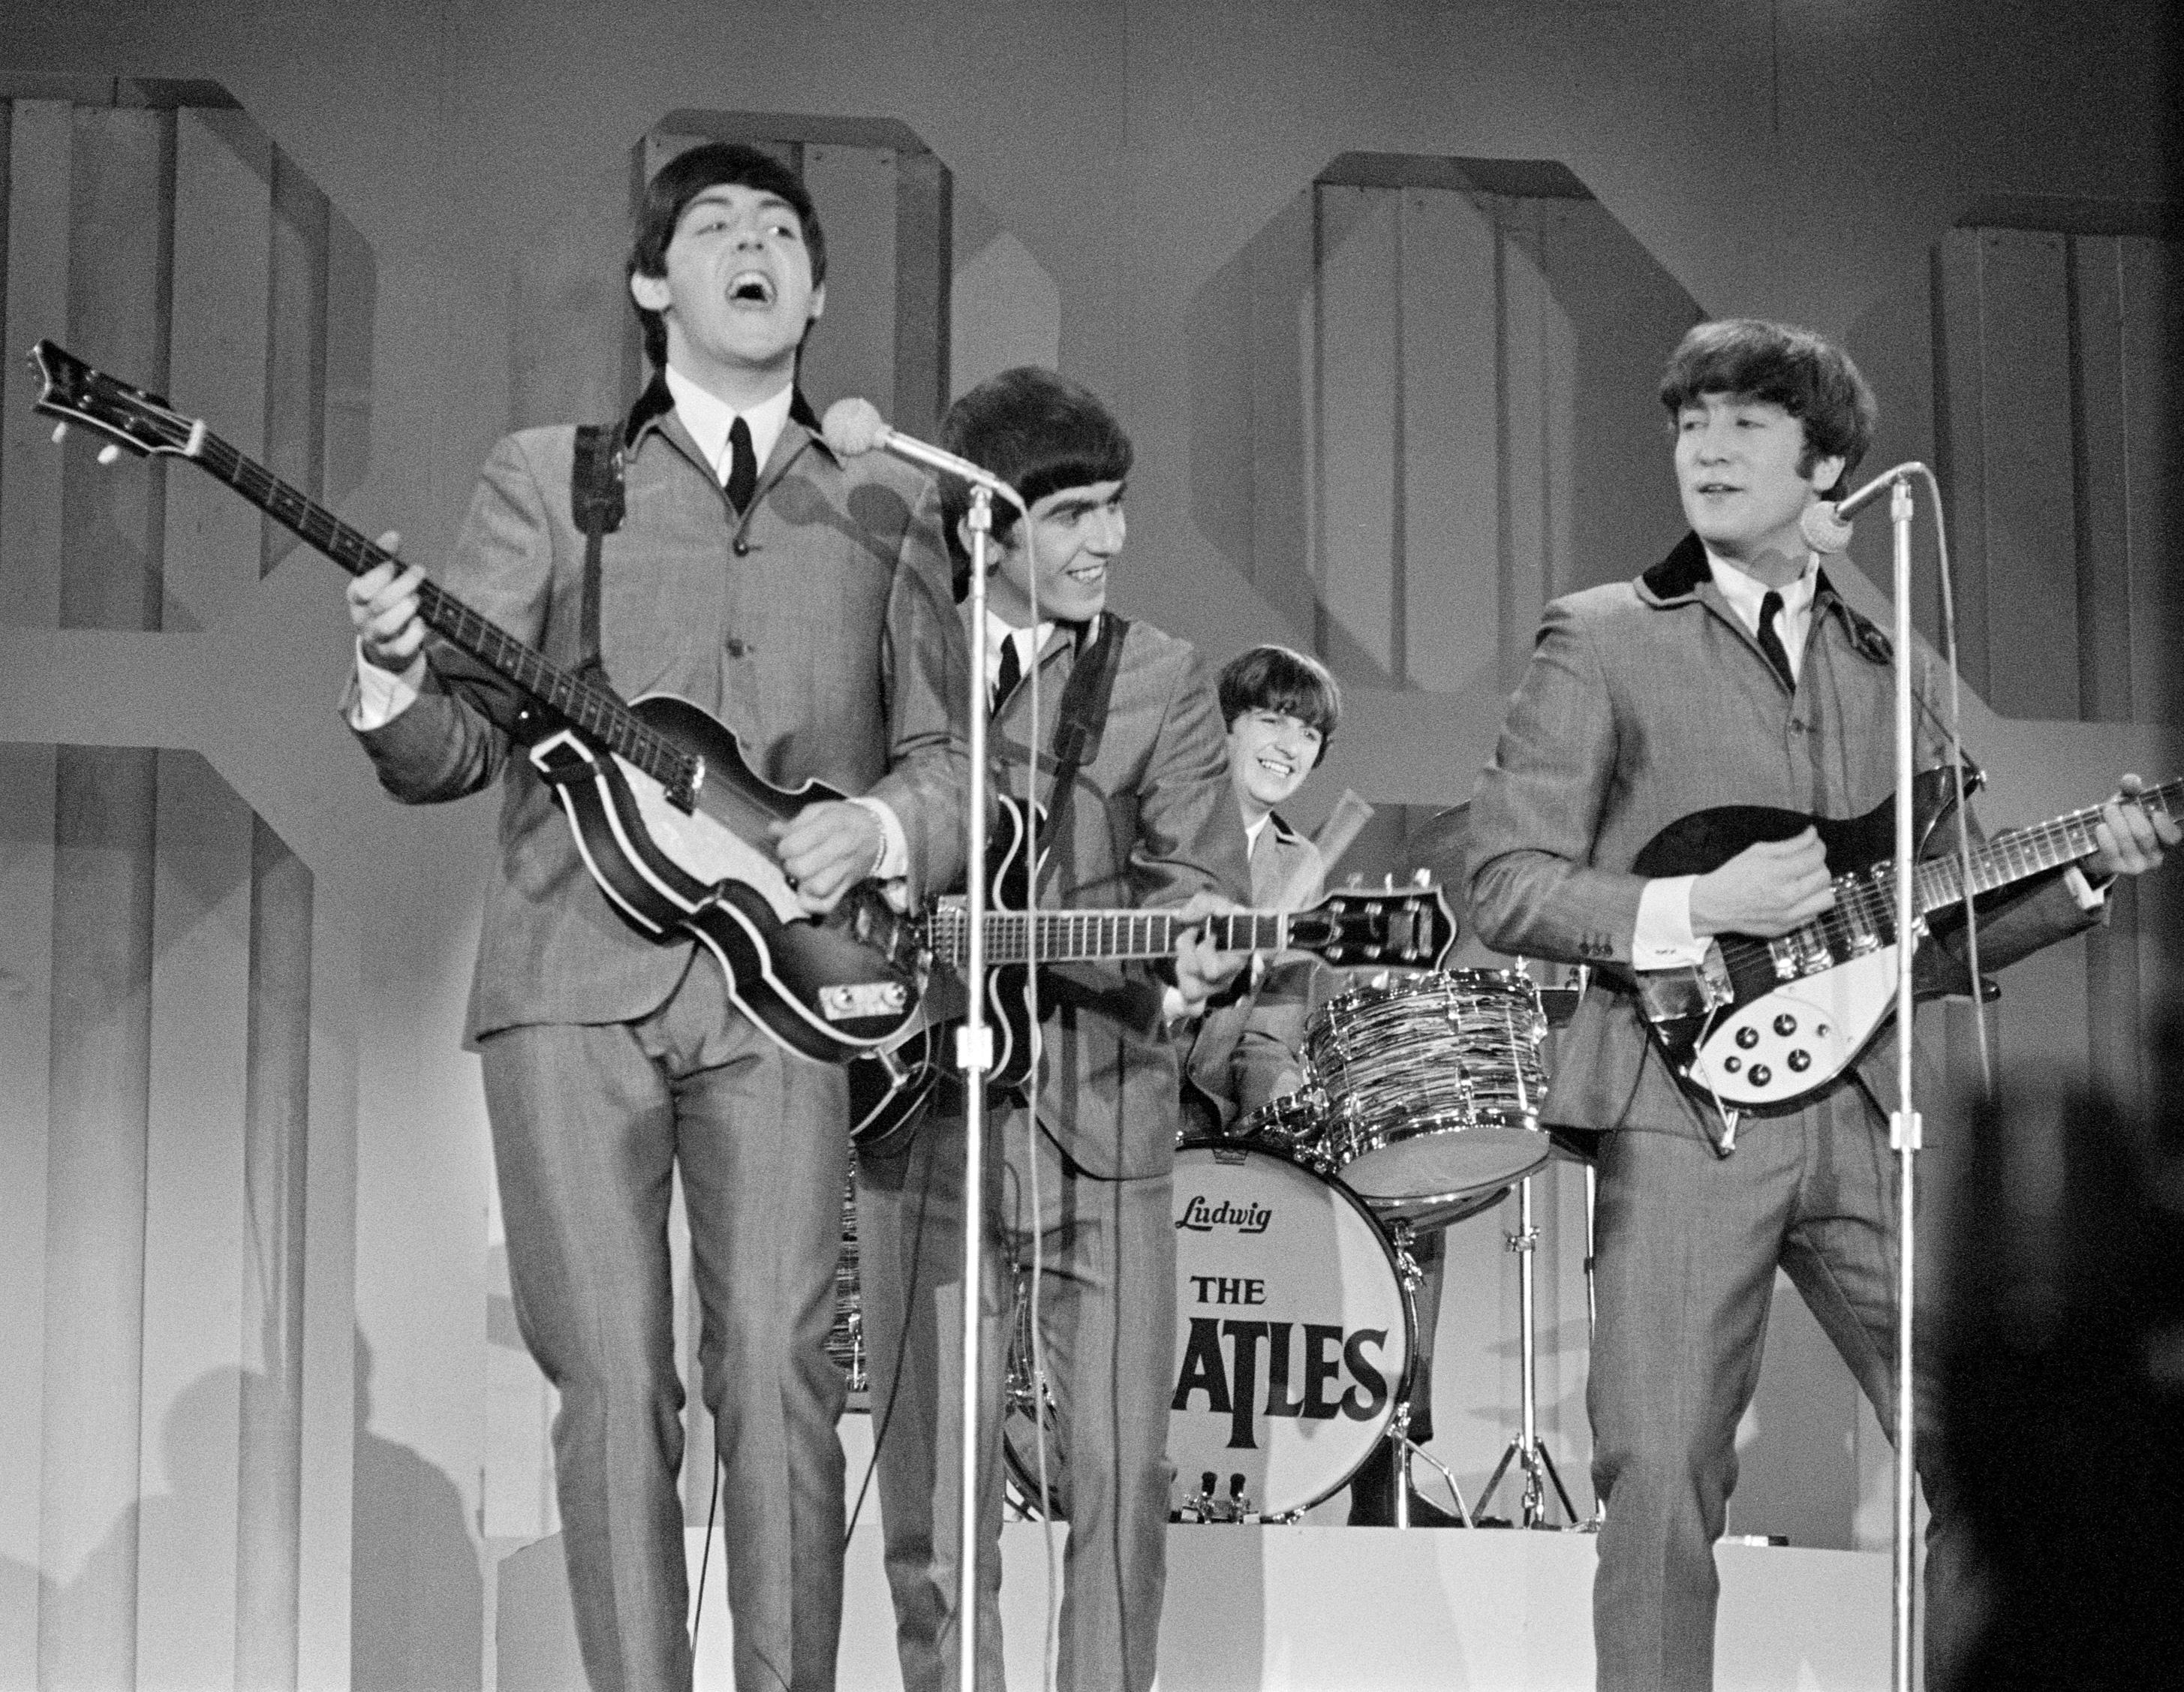 John Lennon Paul Mccartney Wrote This Song Last Minute Ended Up Starting Beatlemania Rock Music Revival